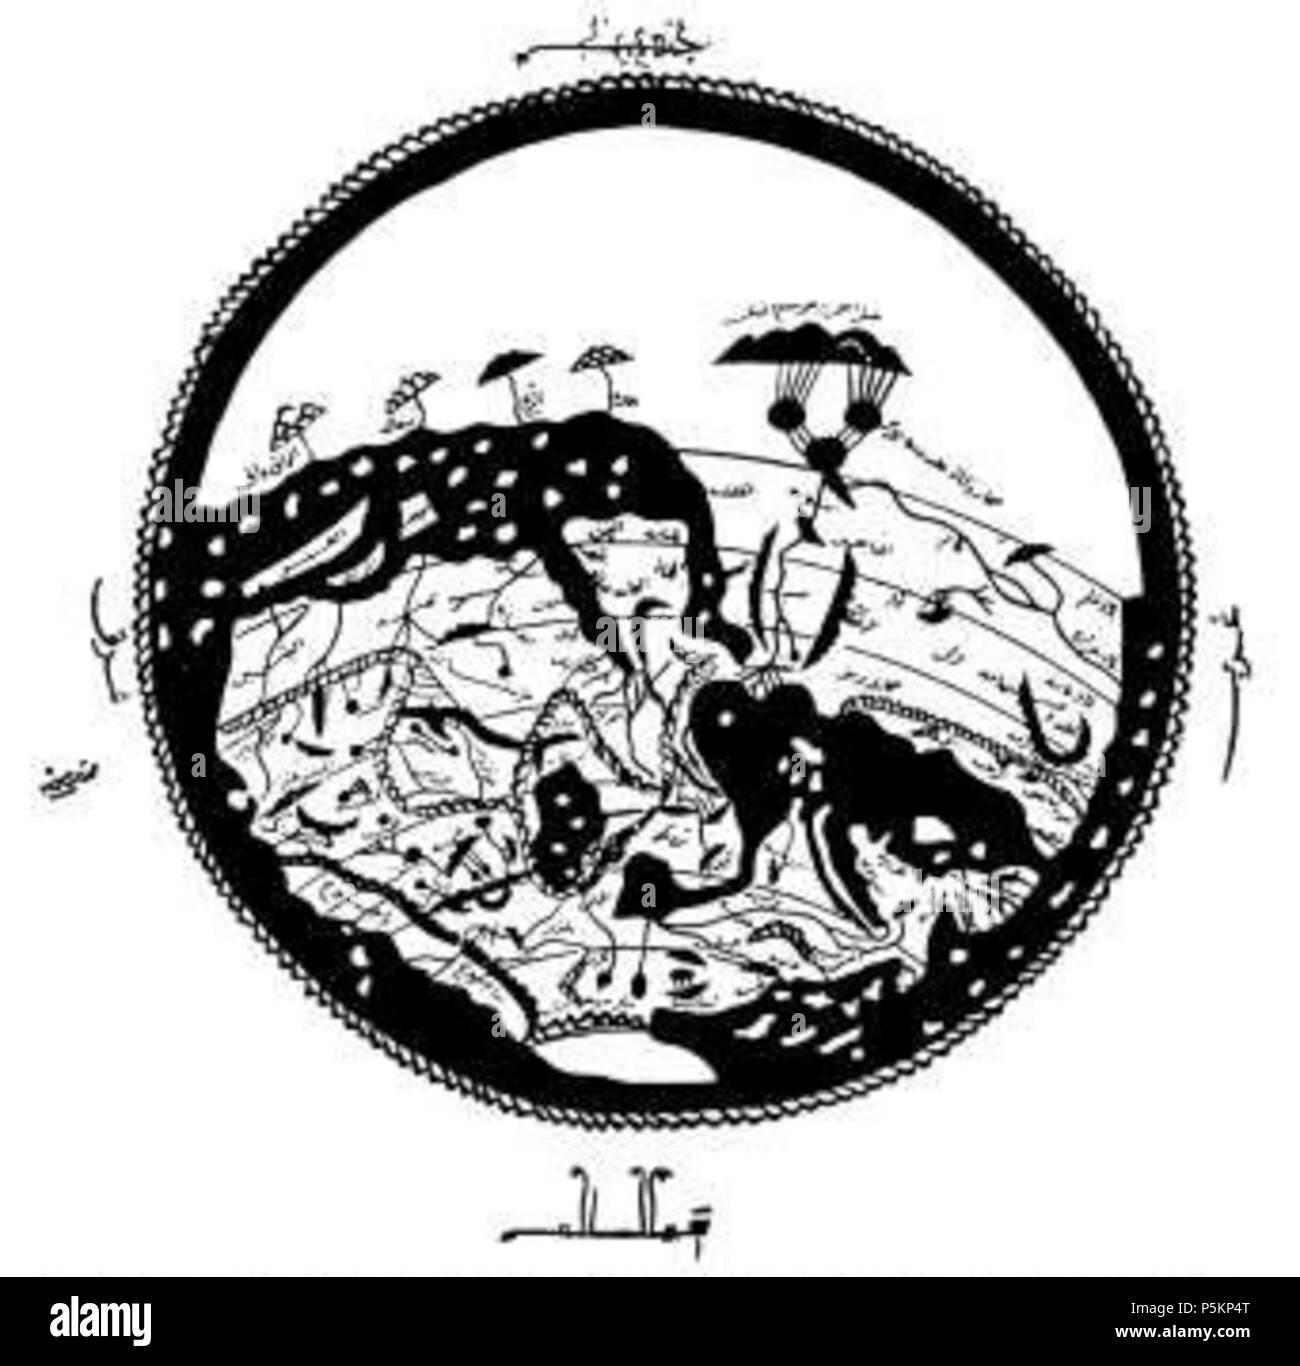 116 Arab world map 1154 - Stock Image